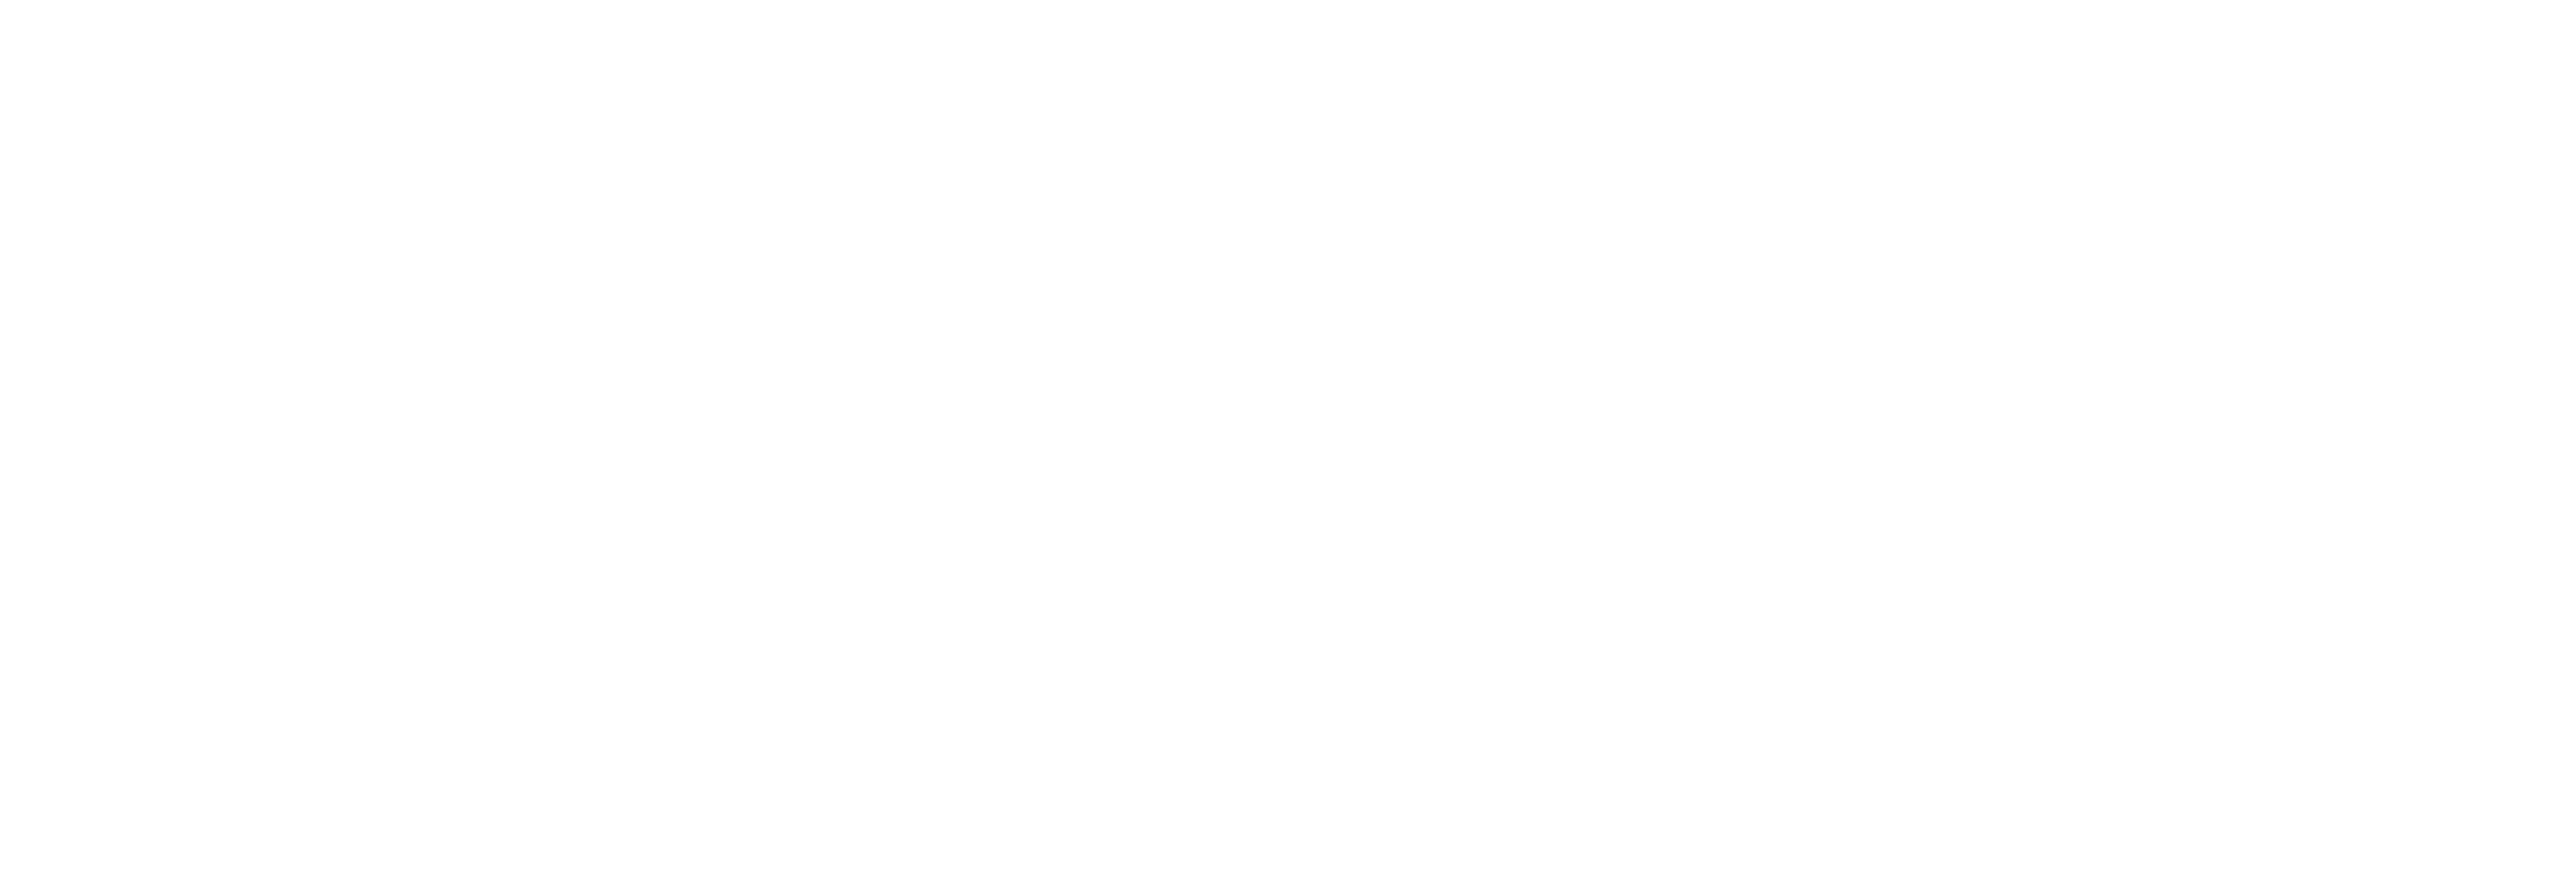 BSI_ISO_9001